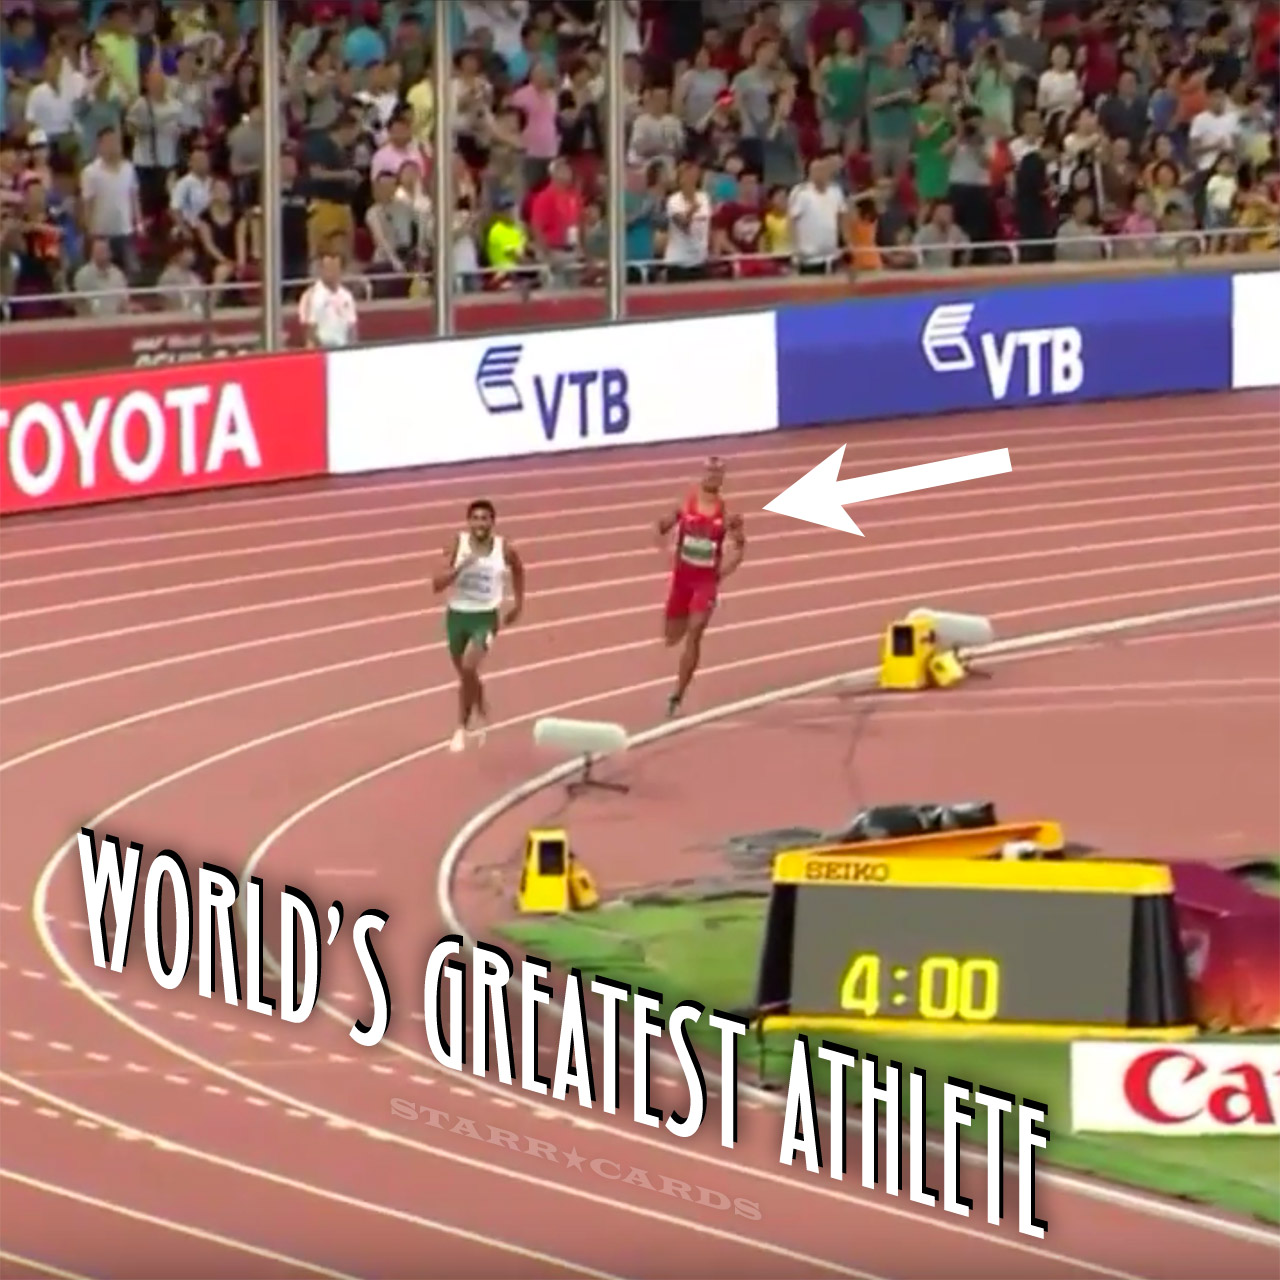 World's Greatest Athlete Ashton Eaton sets new decathlon world record